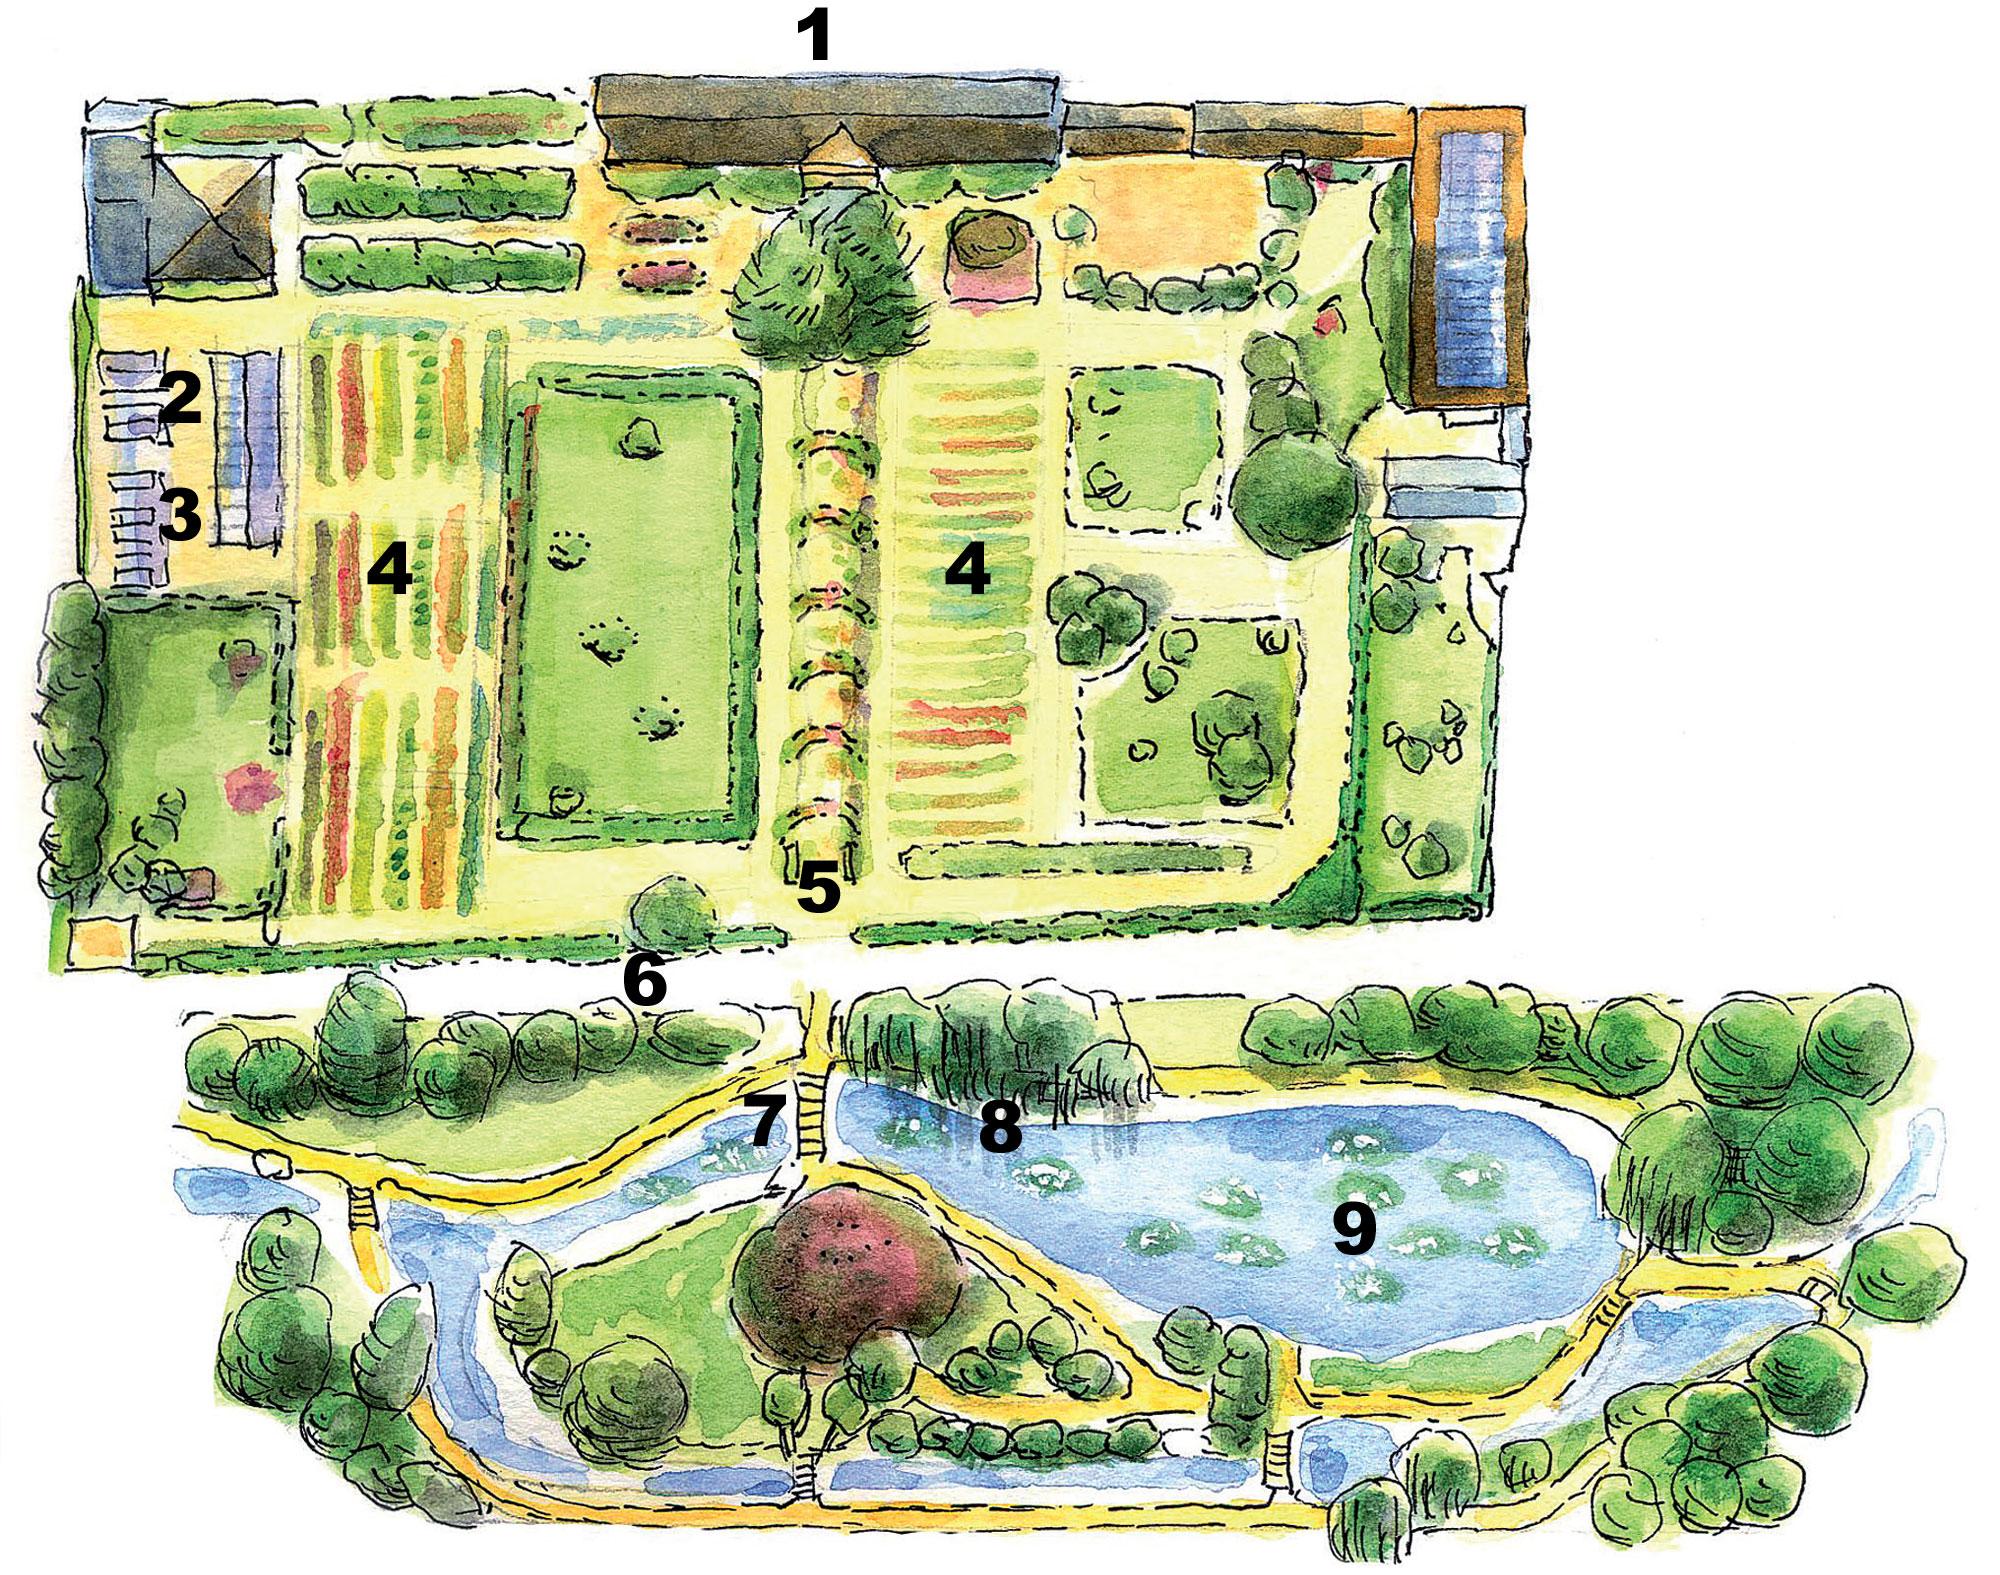 Givernyn puutarhan pohjapiirros